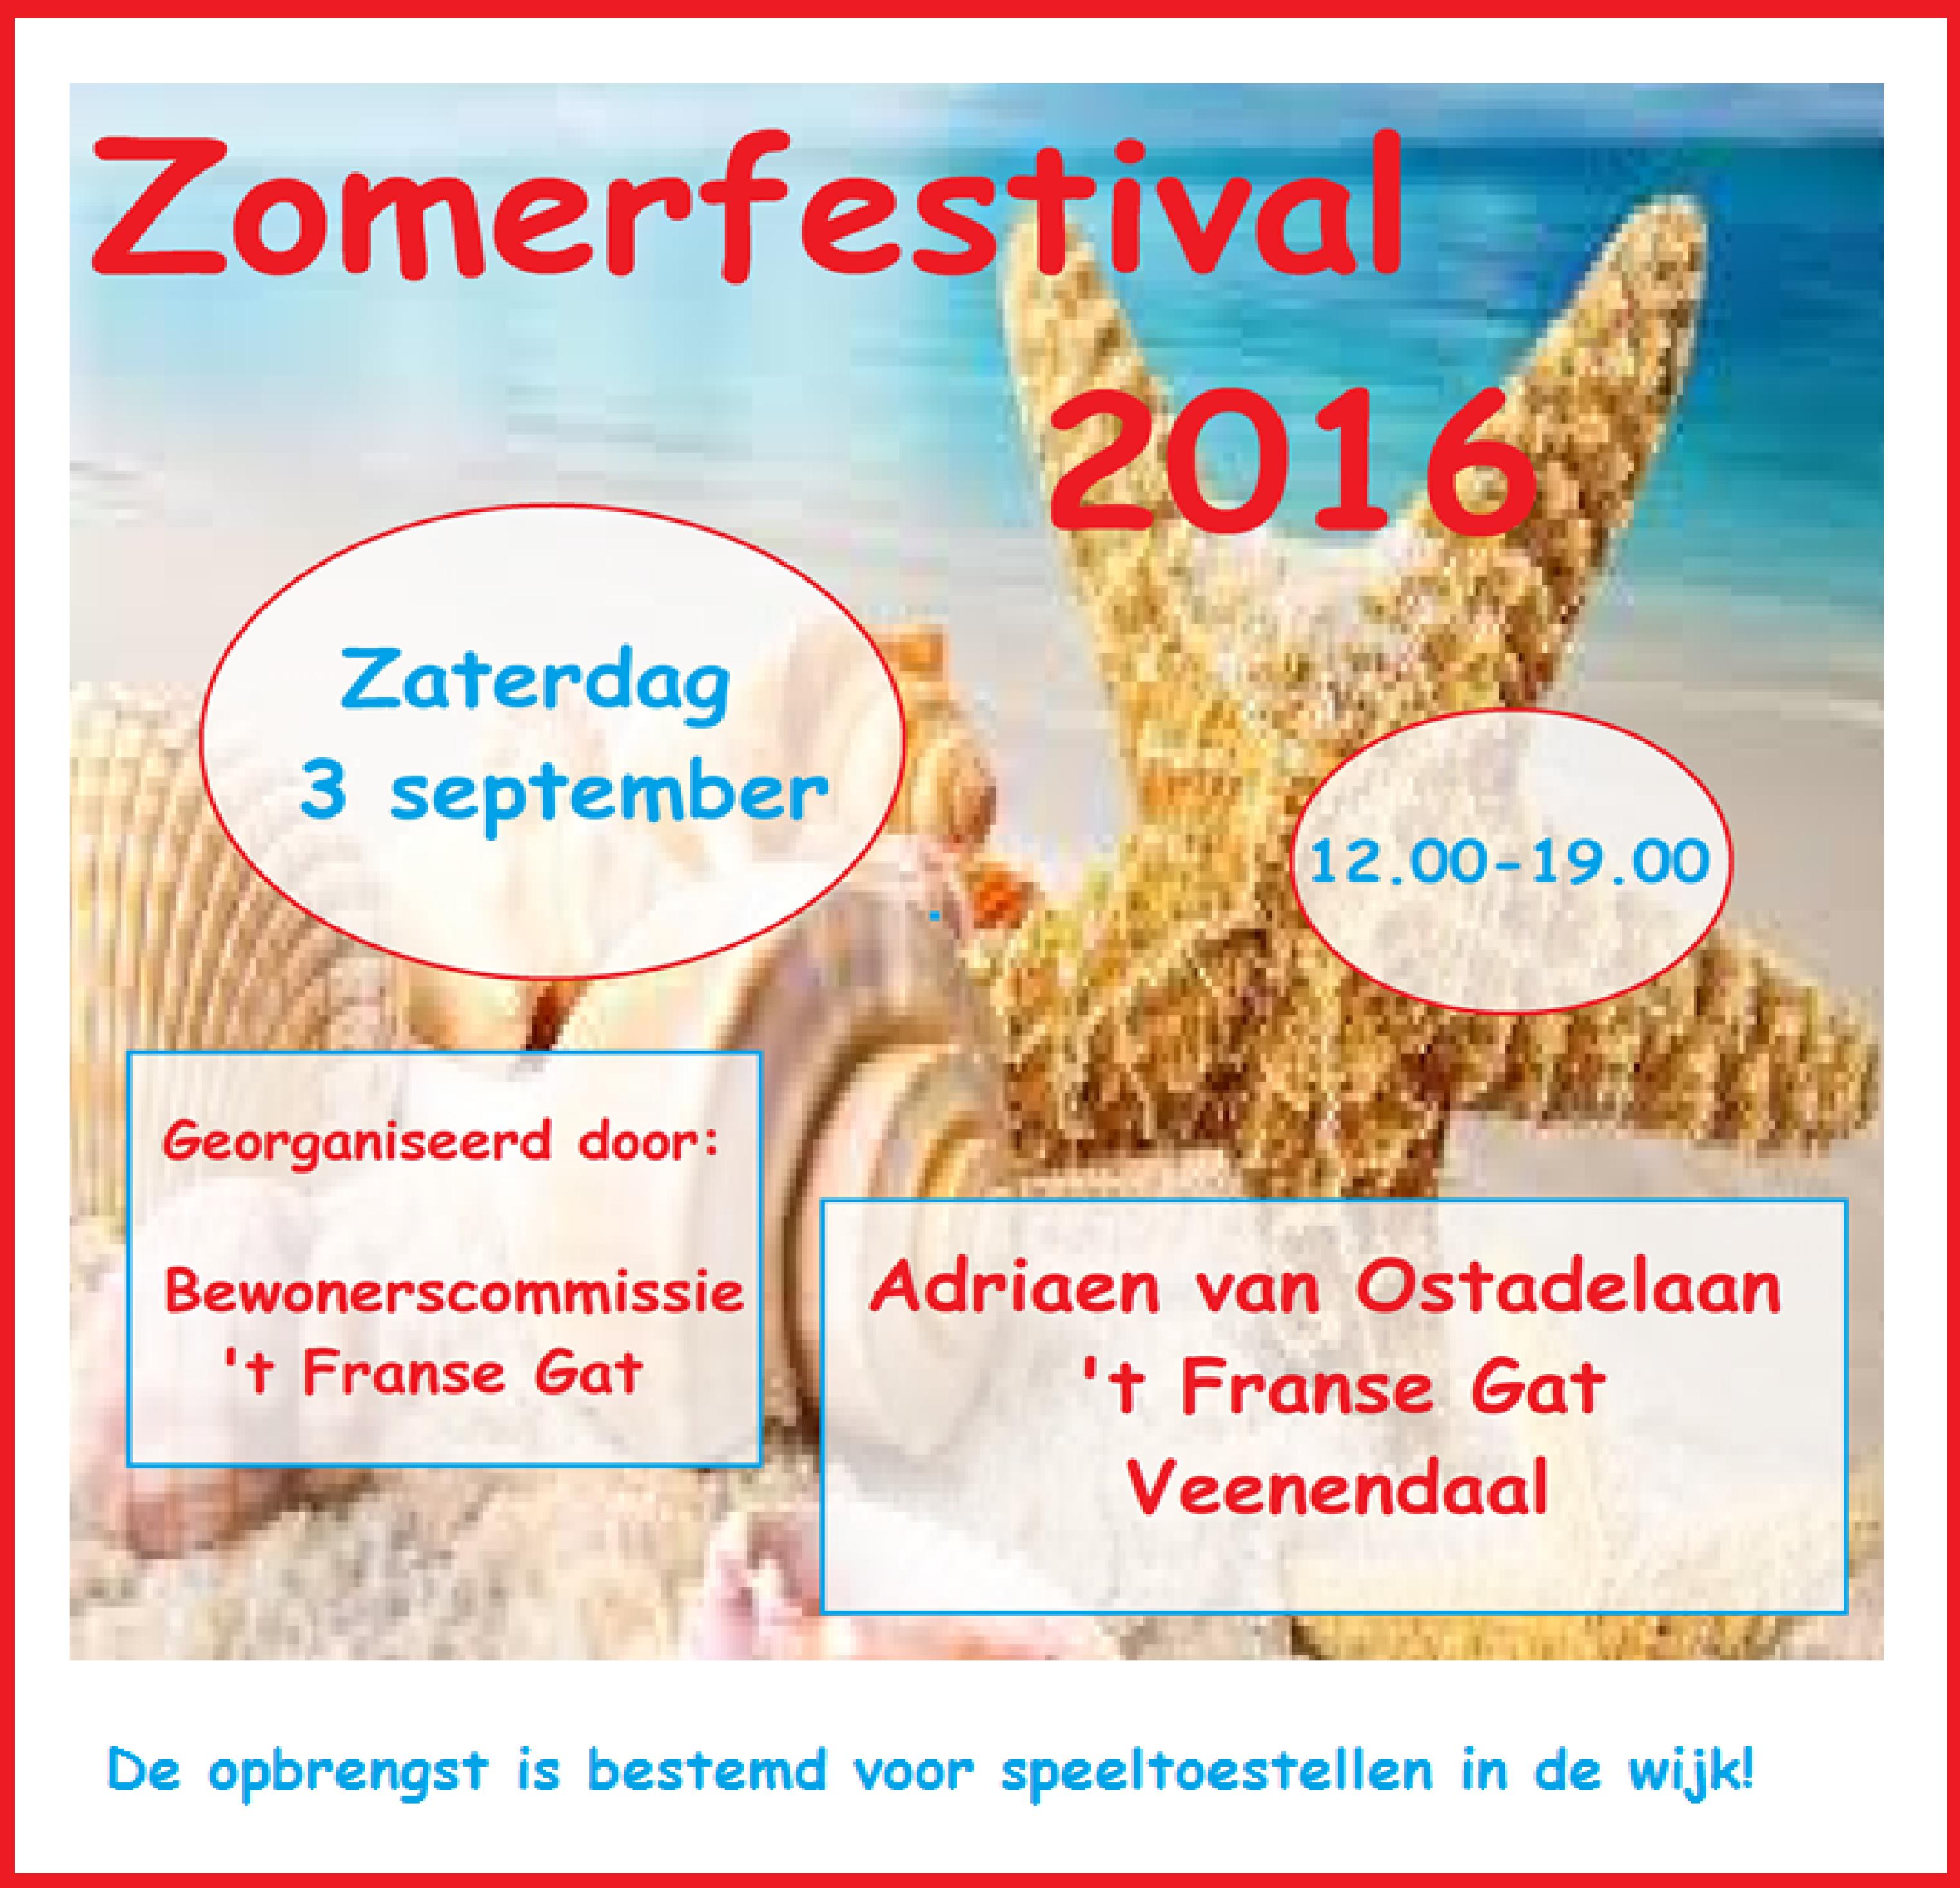 Zomerfestival 2016